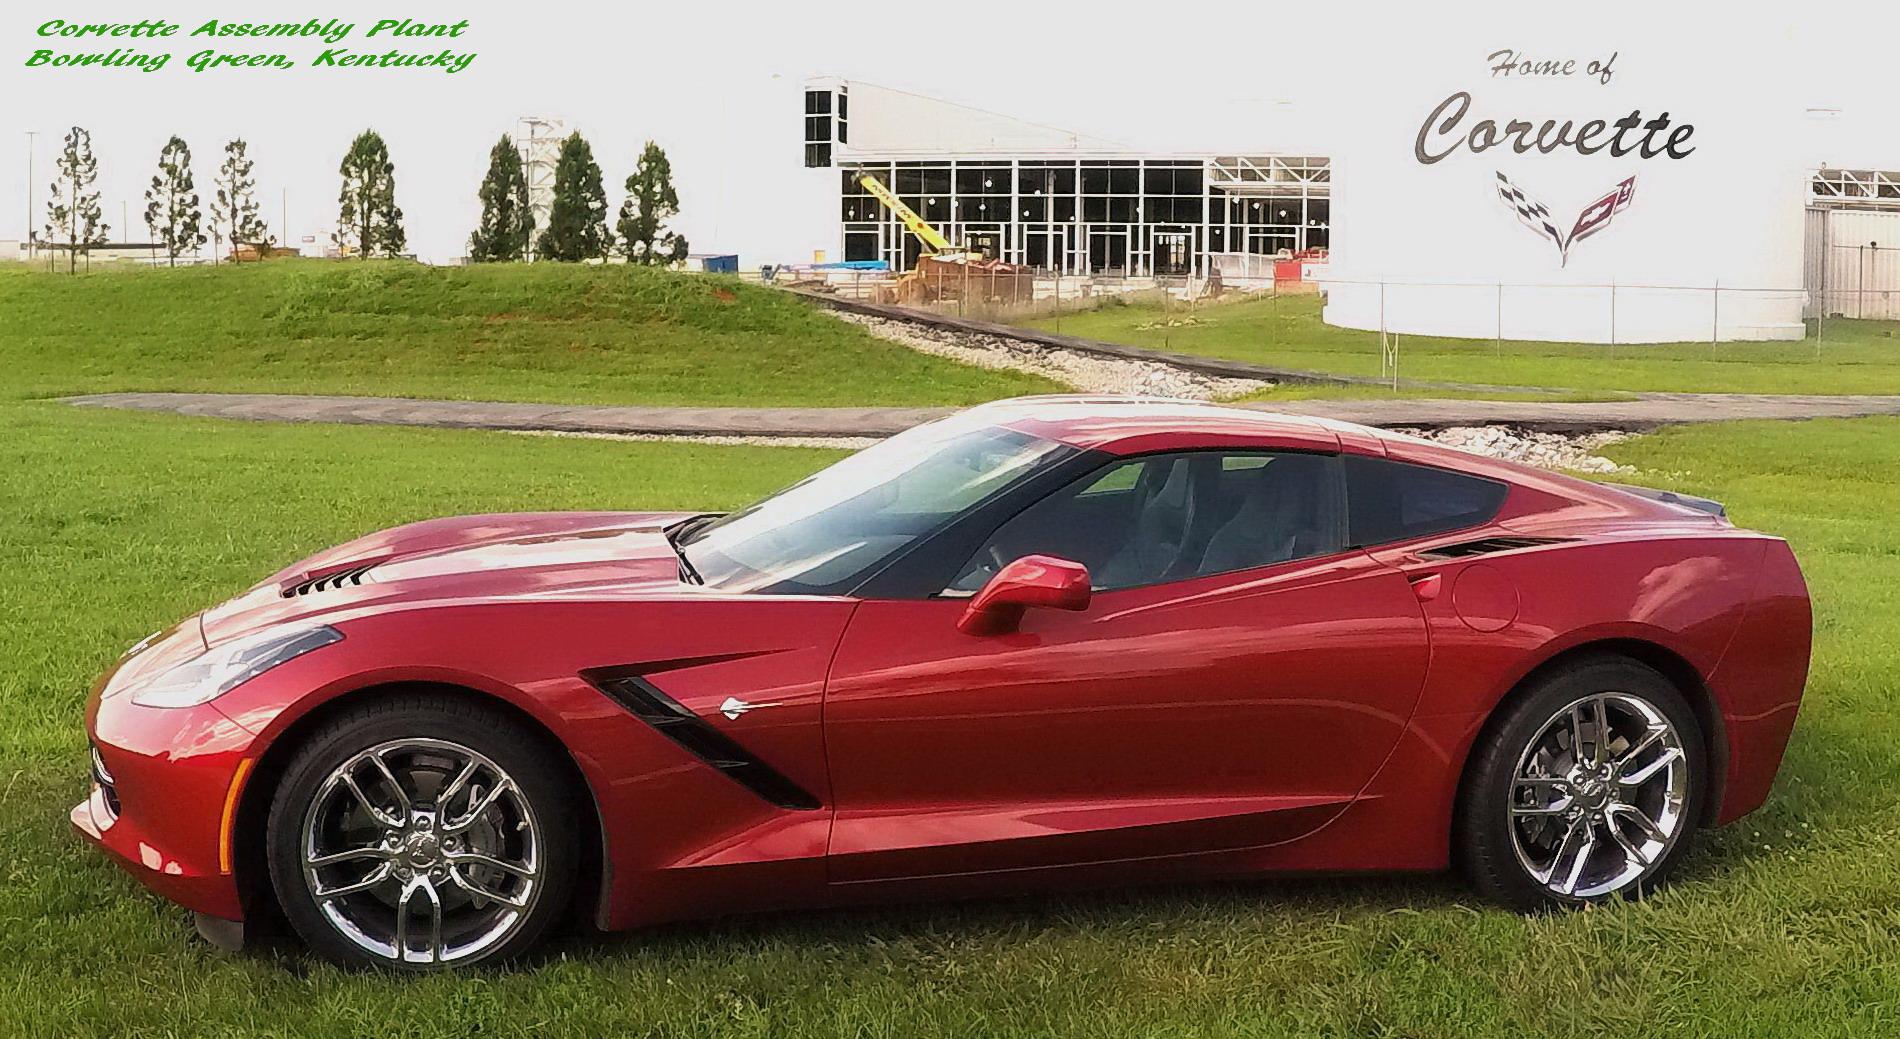 Name:  Corvette Assenbly close crop text.jpg Views: 219 Size:  601.8 KB